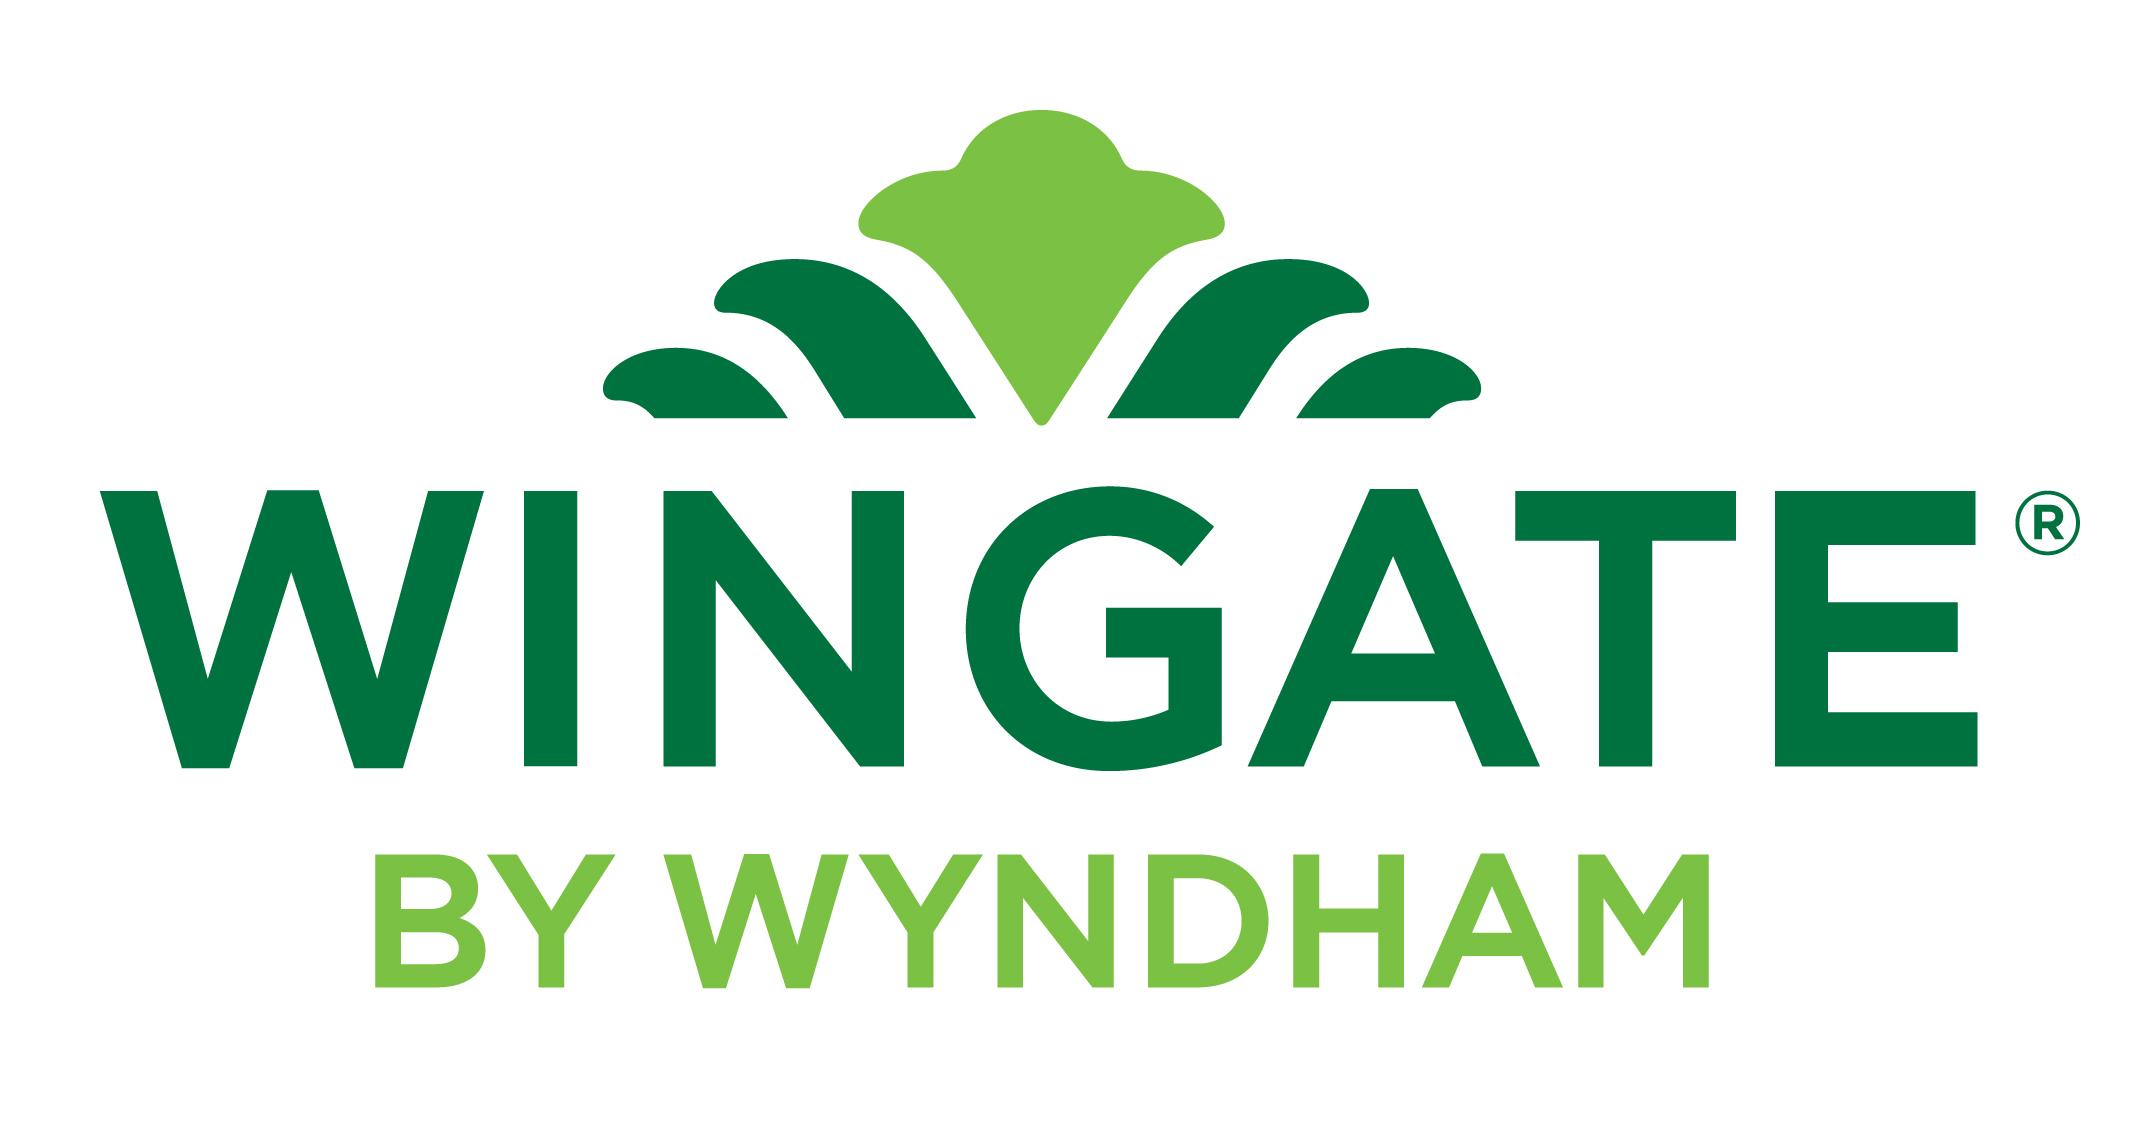 wingate_logo.jpg